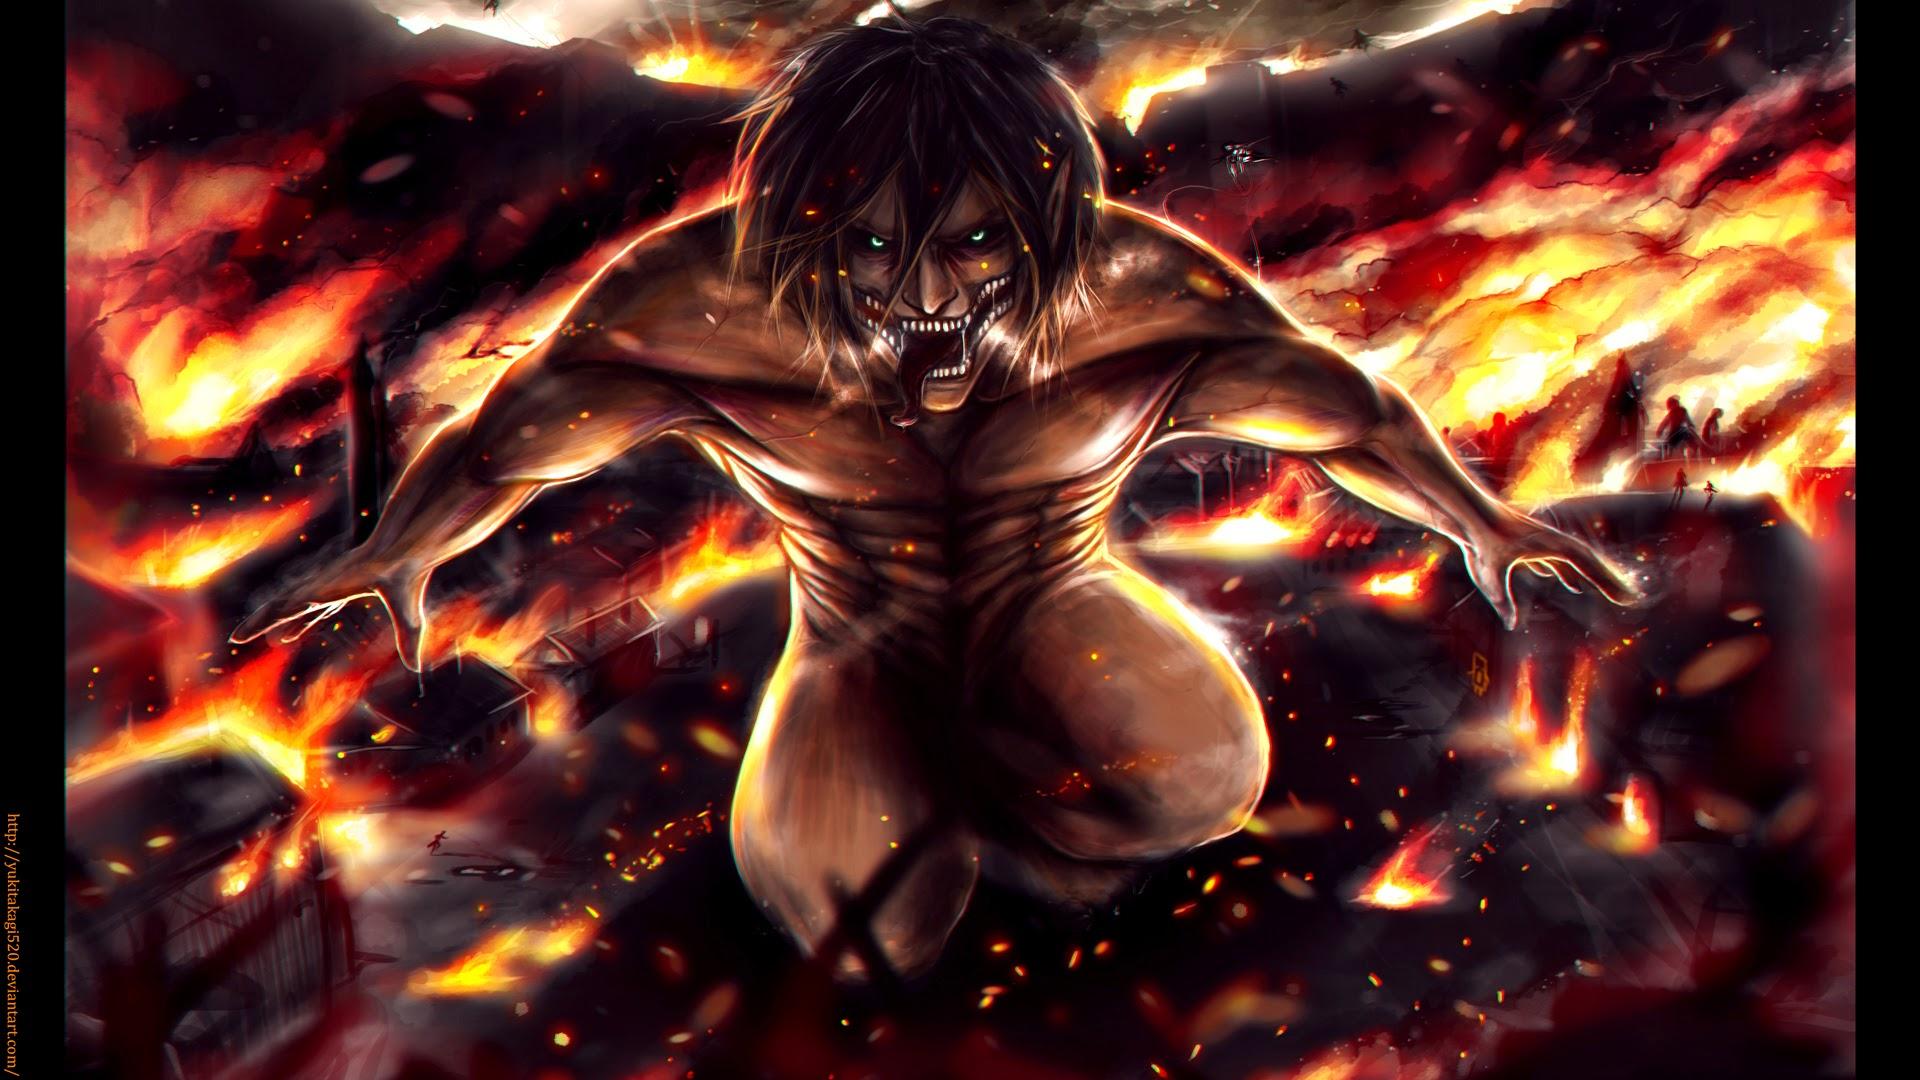 Attack On Titan Eren Wallpaper 1080p Eren yeager jaeger rogue titan 1920x1080